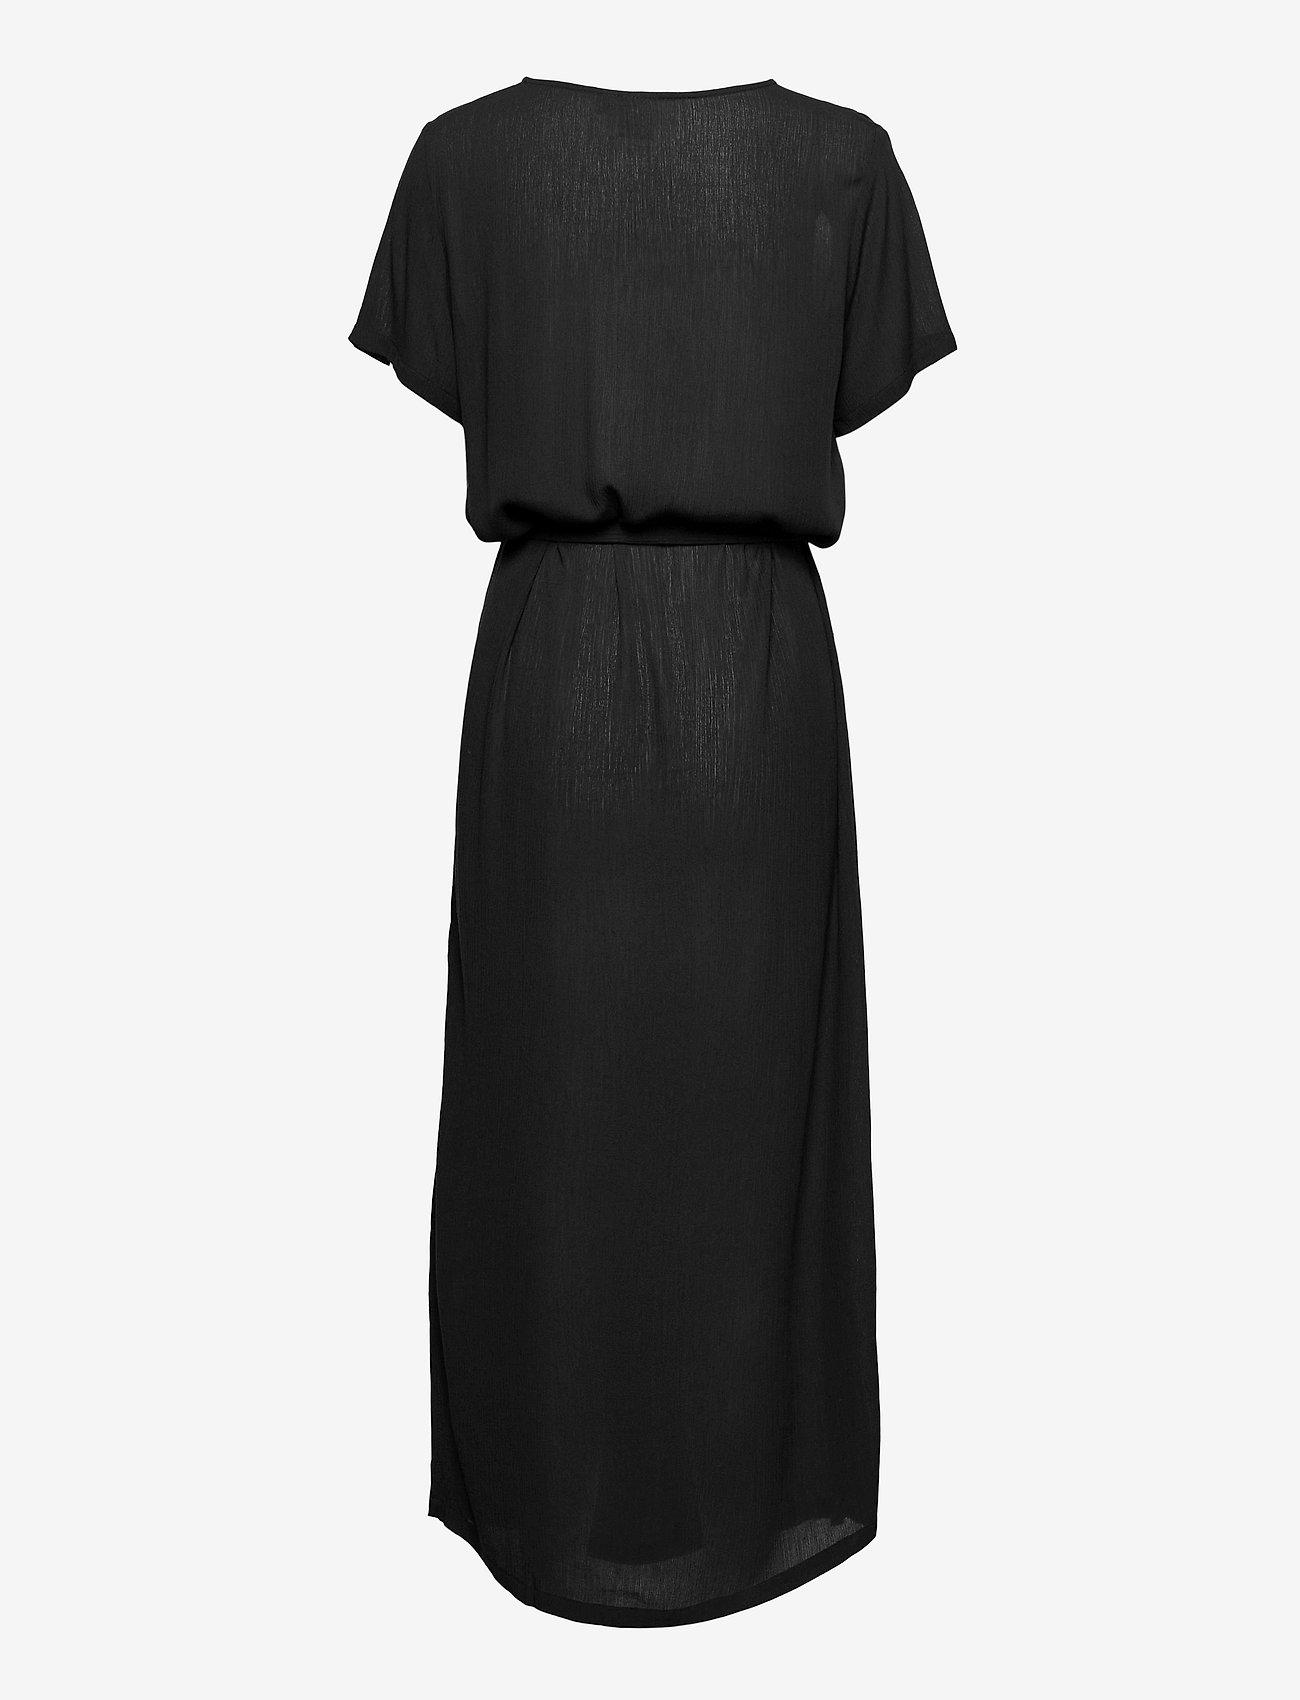 ICHI - IHMARRAKECH SO DR4 - maxi dresses - black - 1